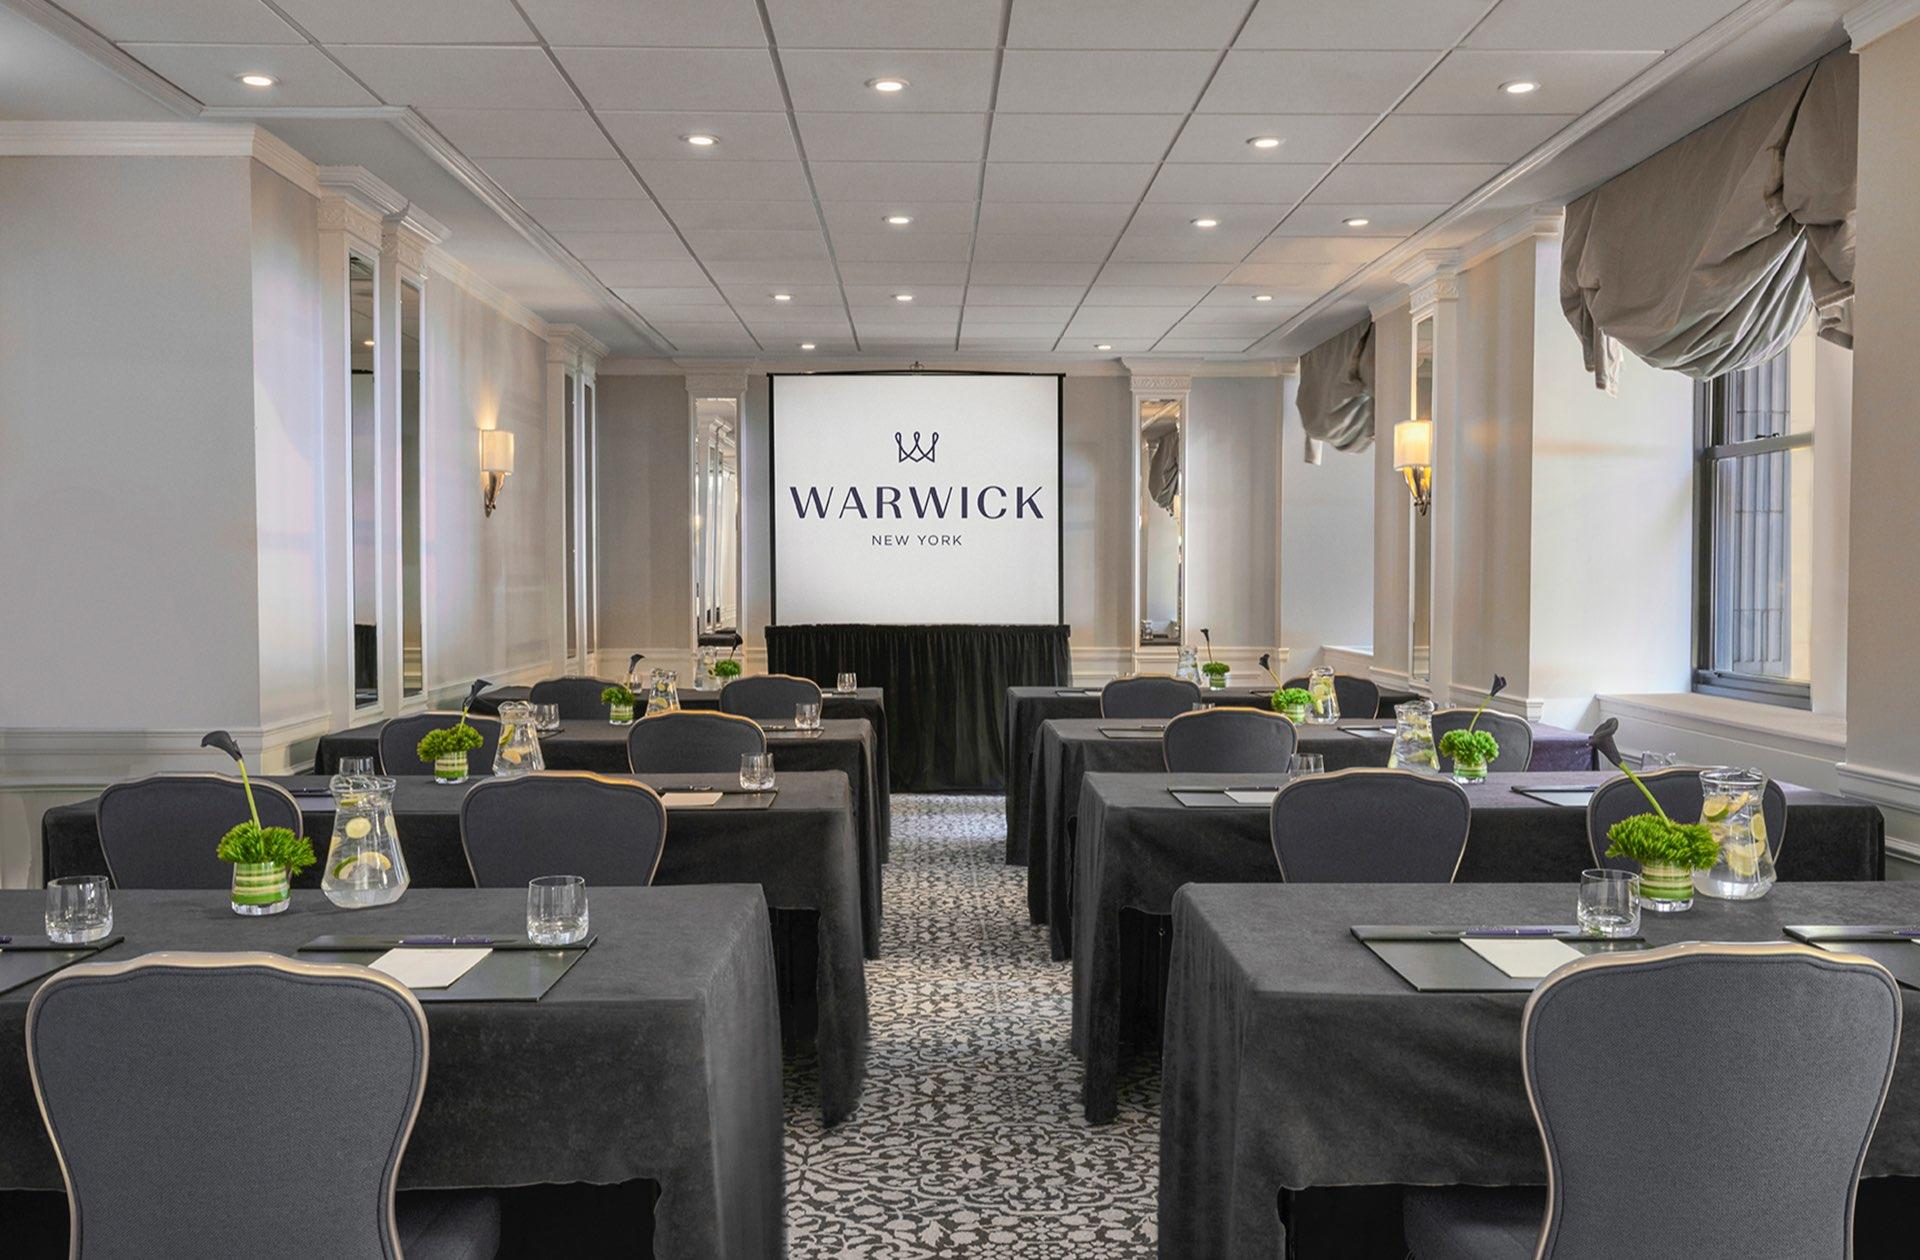 Essex Meeting Room at Warwick New York